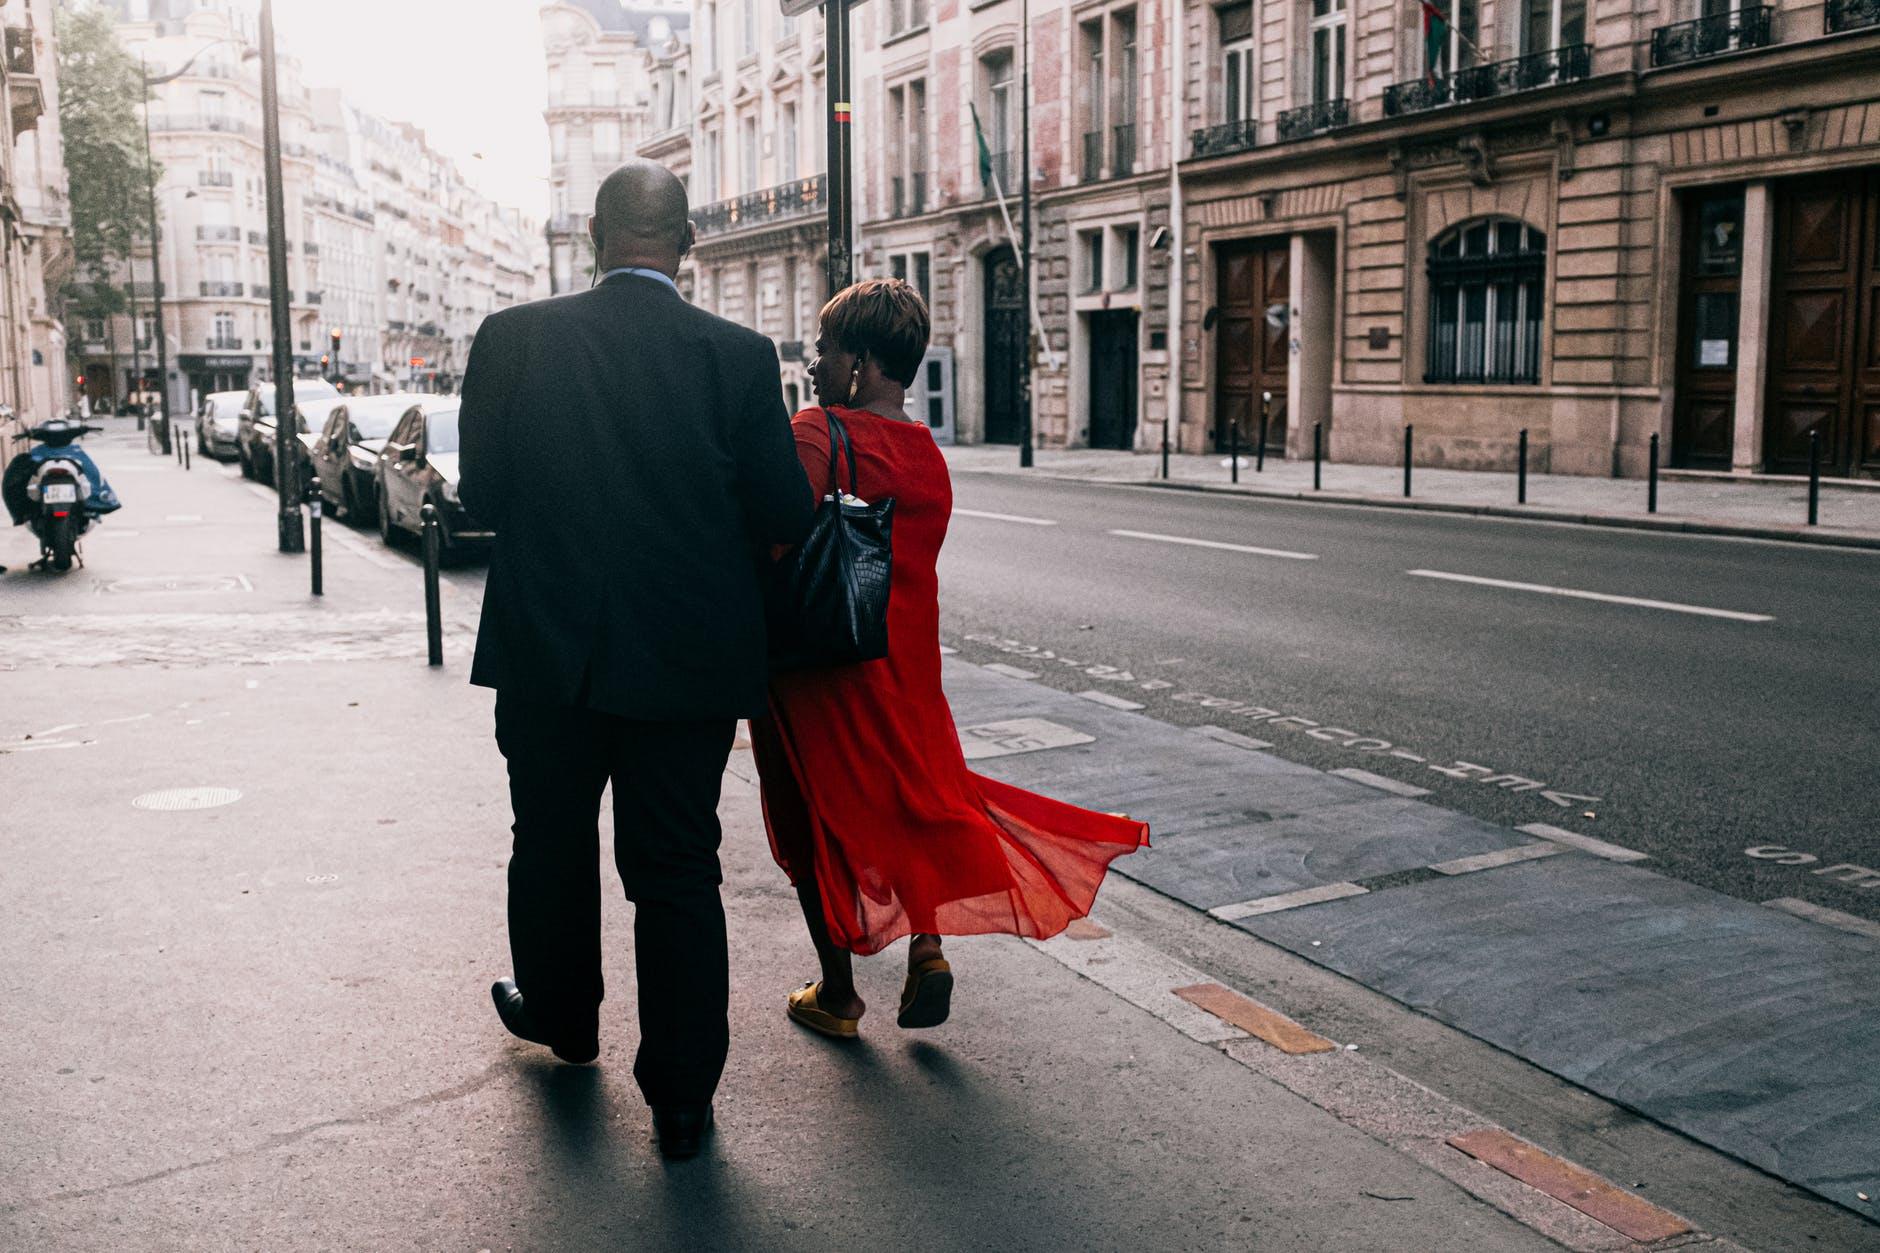 man and woman walking on sidewalk